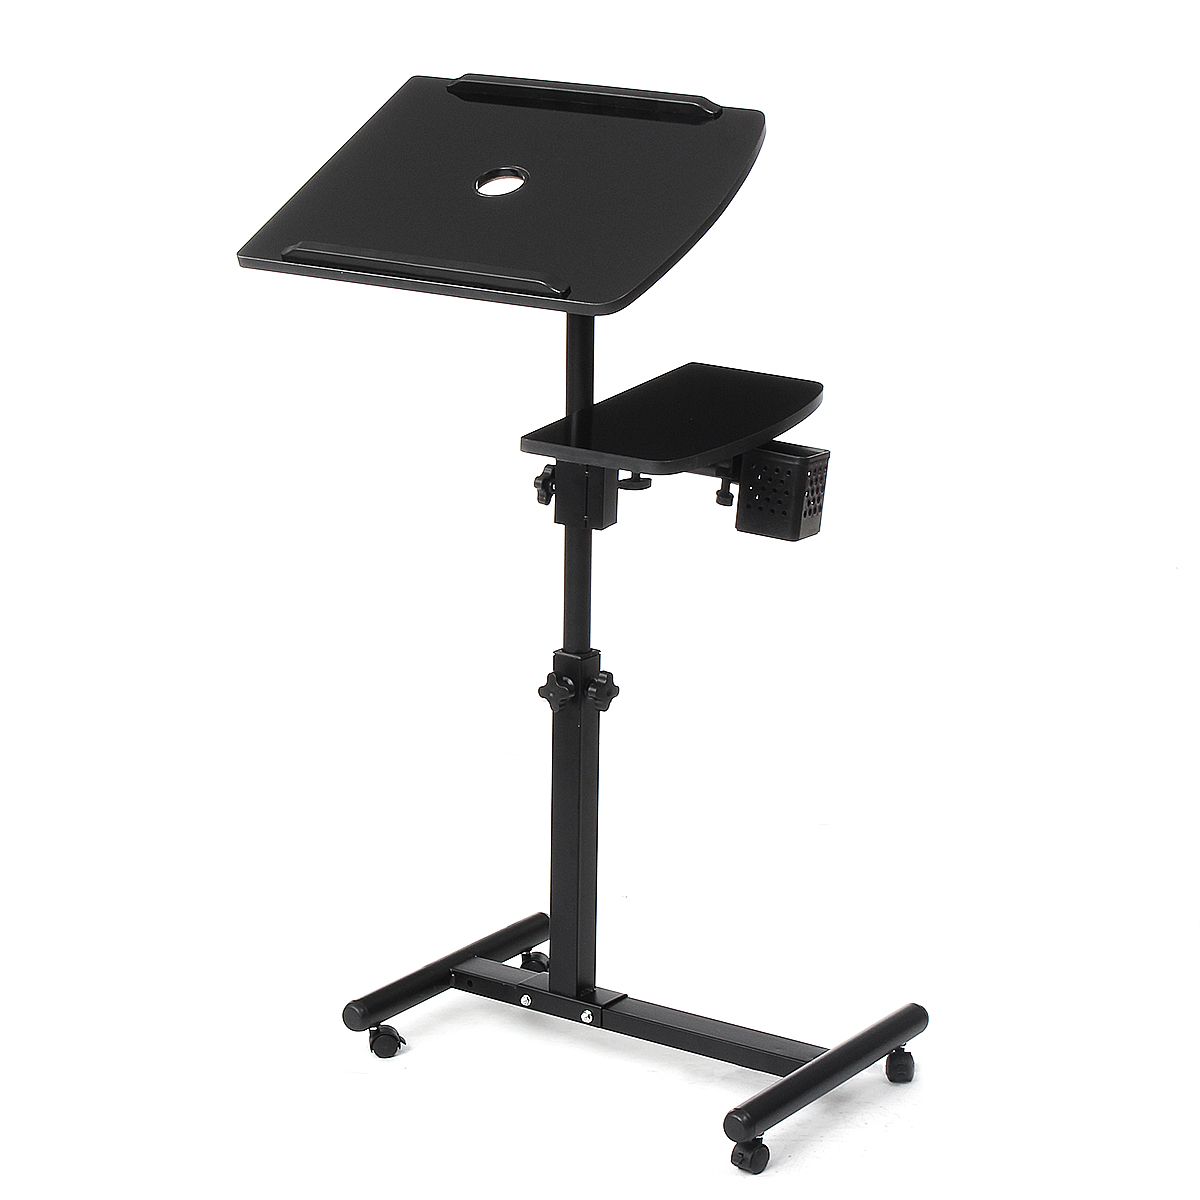 Fashion Lifting Mobile Notebook Desktop Stand Table Adjustable Computer Desk Bedside Sofa Bed Folding Portable Laptop Table